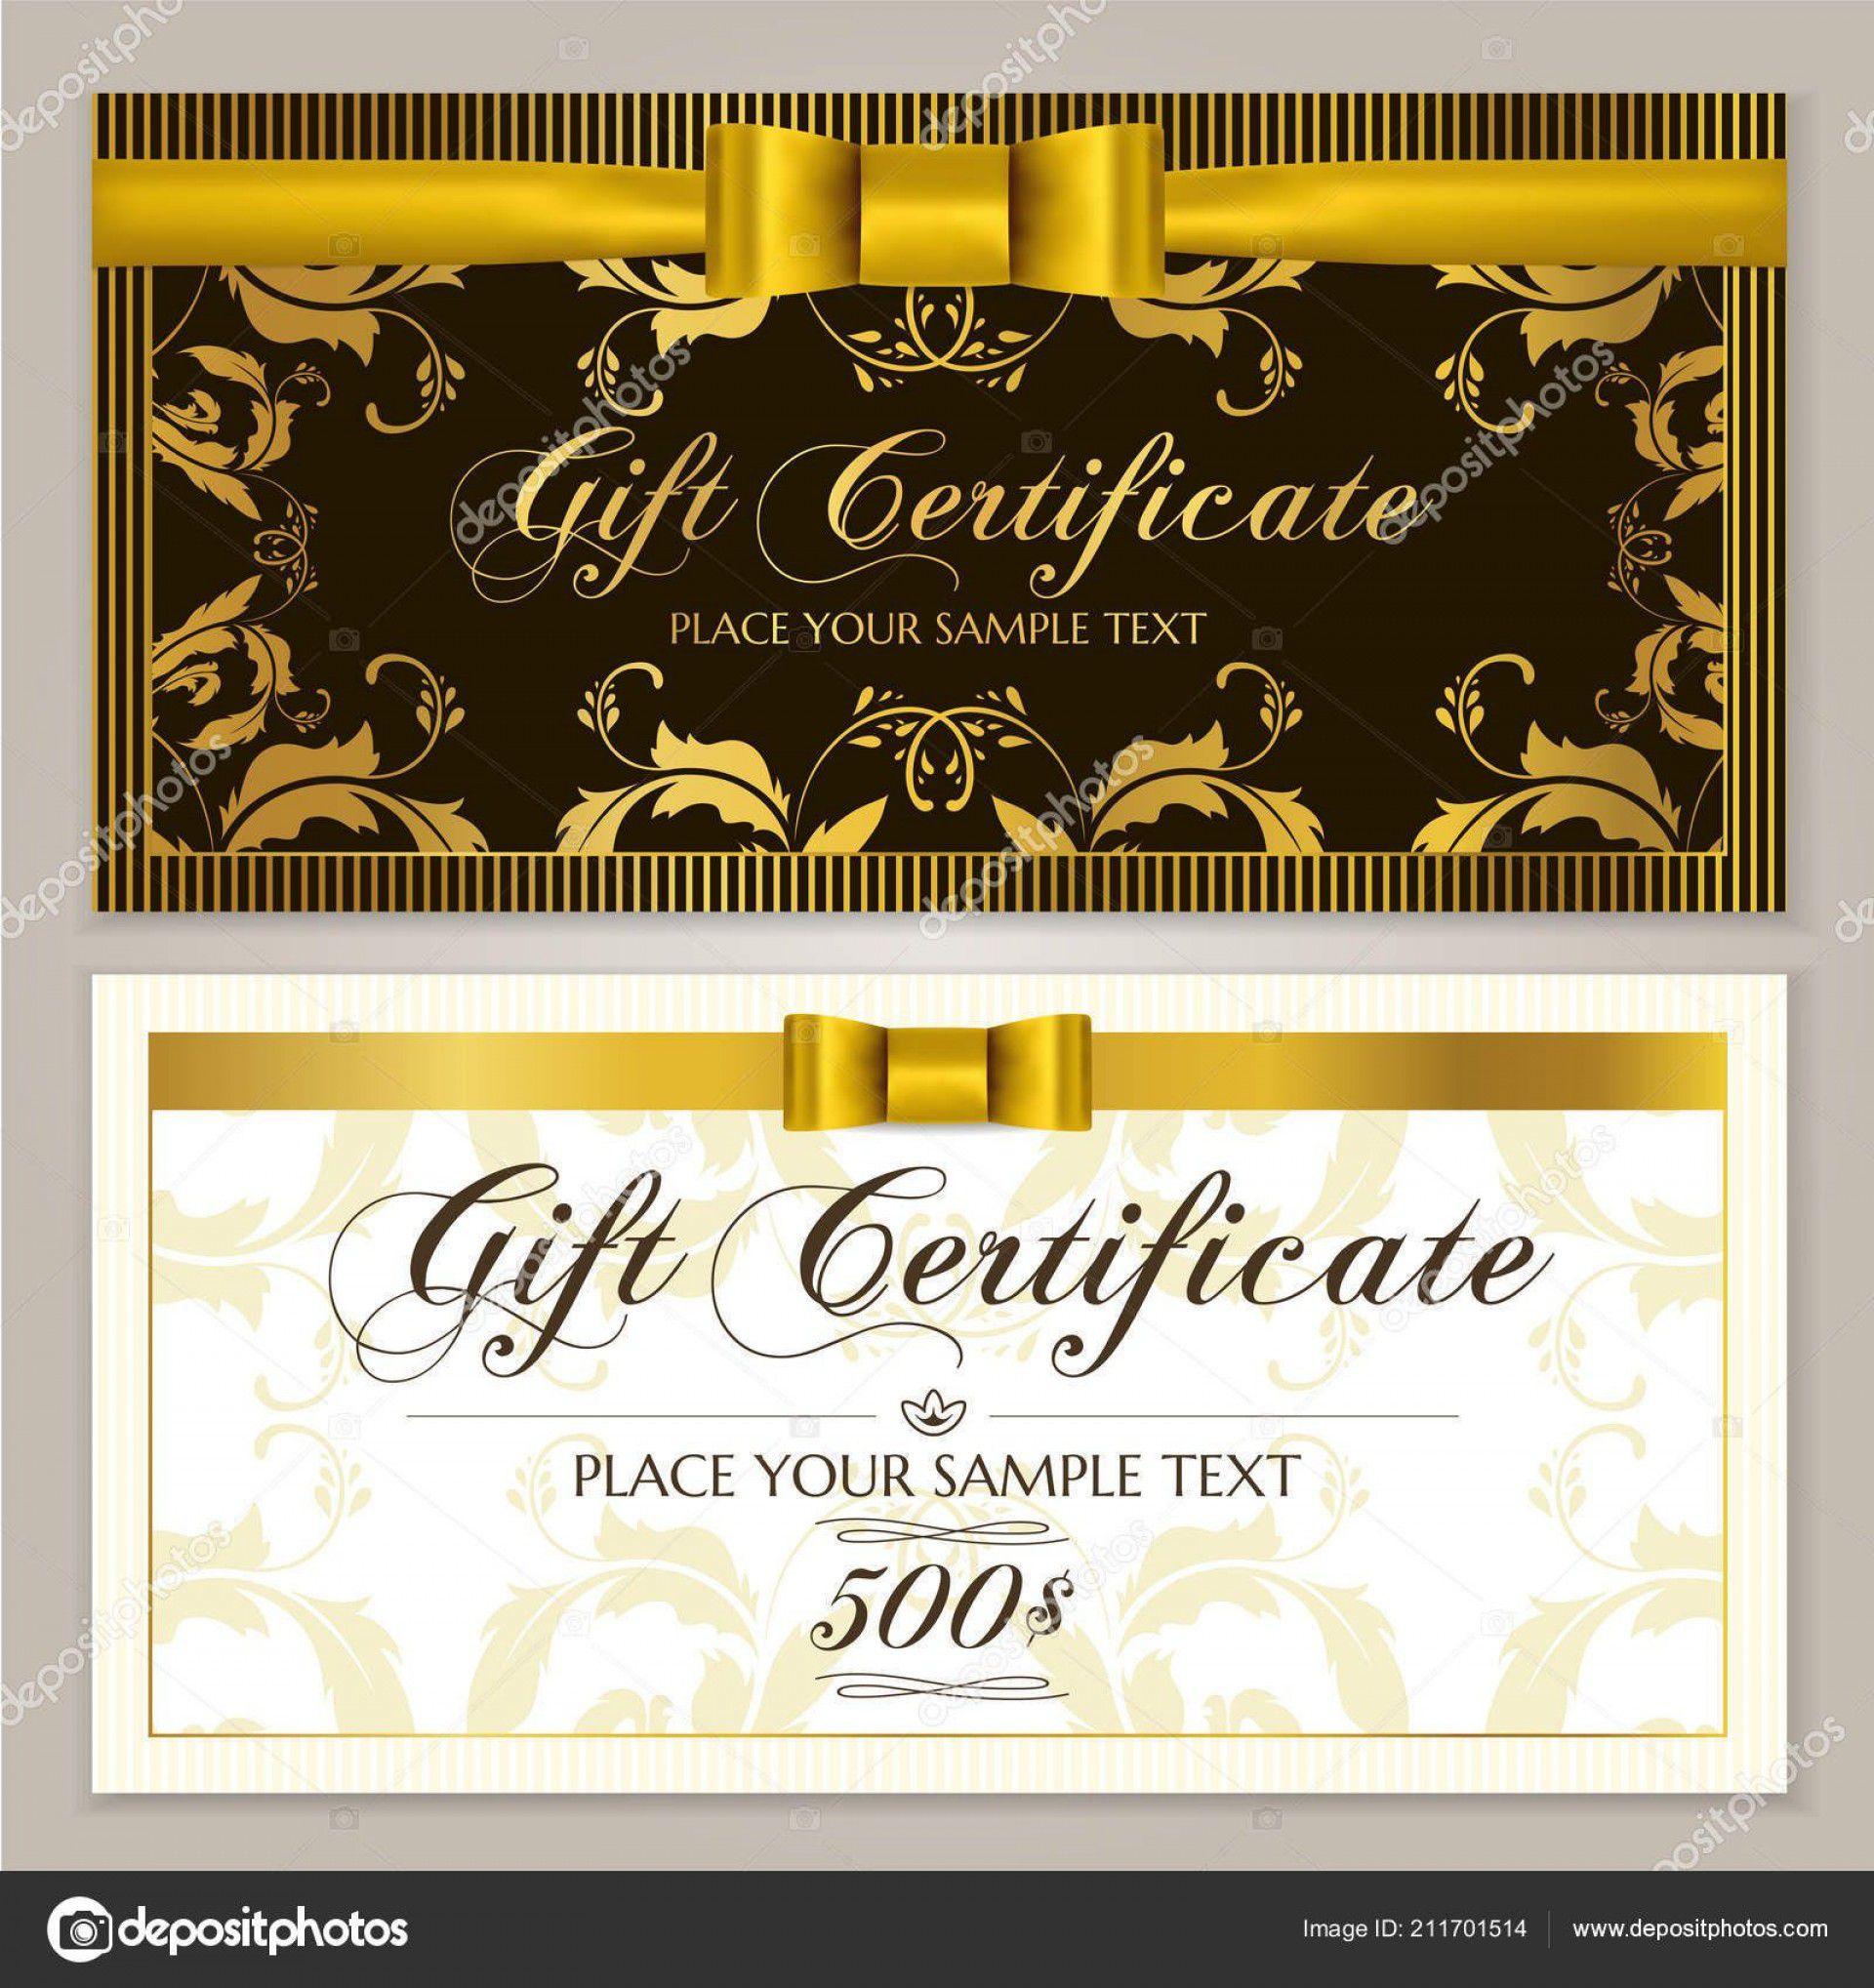 000 Unbelievable Restaurant Gift Certificate Template High Resolution  Templates Card Word Voucher FreeFull